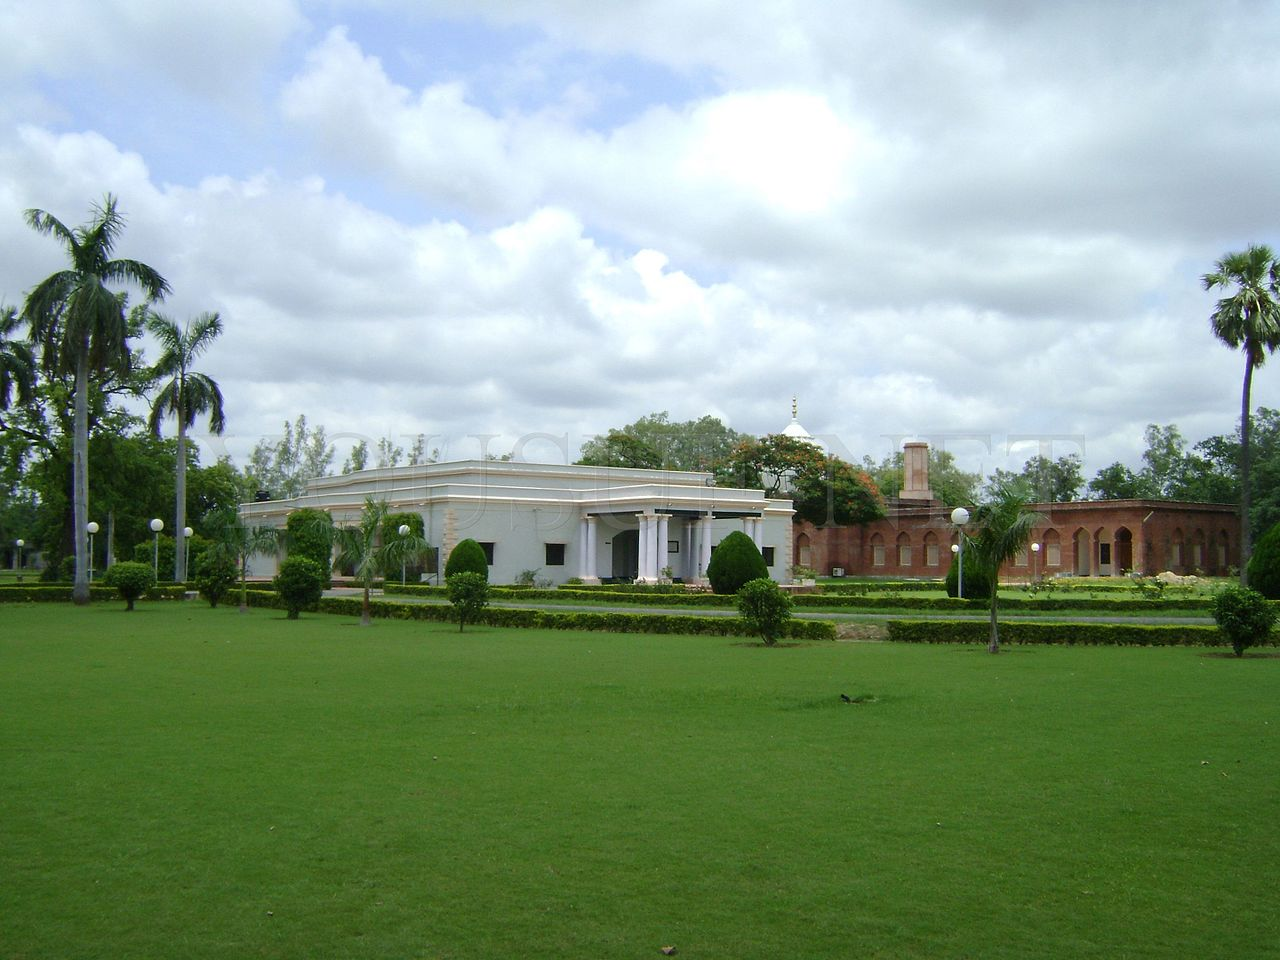 Amazing Destination in Aligarh-Sir Syed Academy Museum